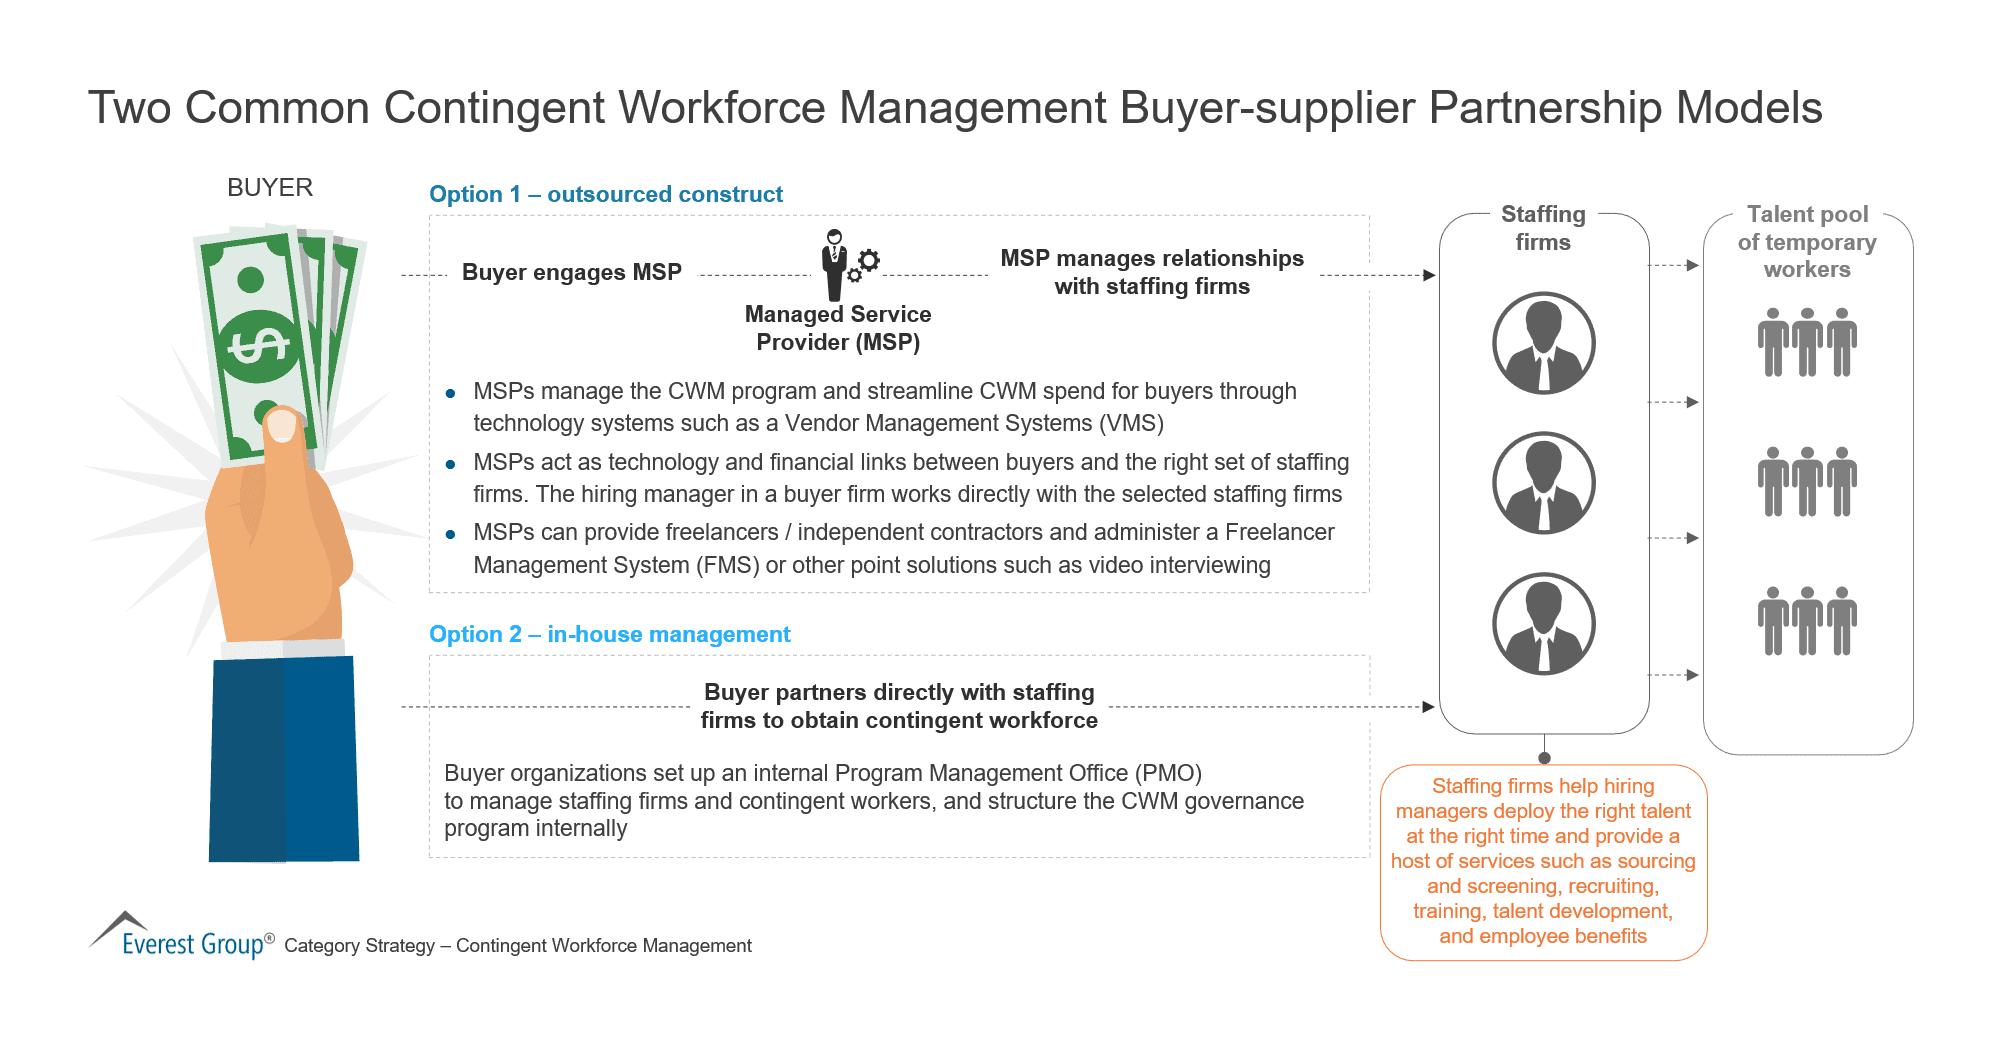 Two Common Contingent Workforce Management Buyer-supplier Partnership Models